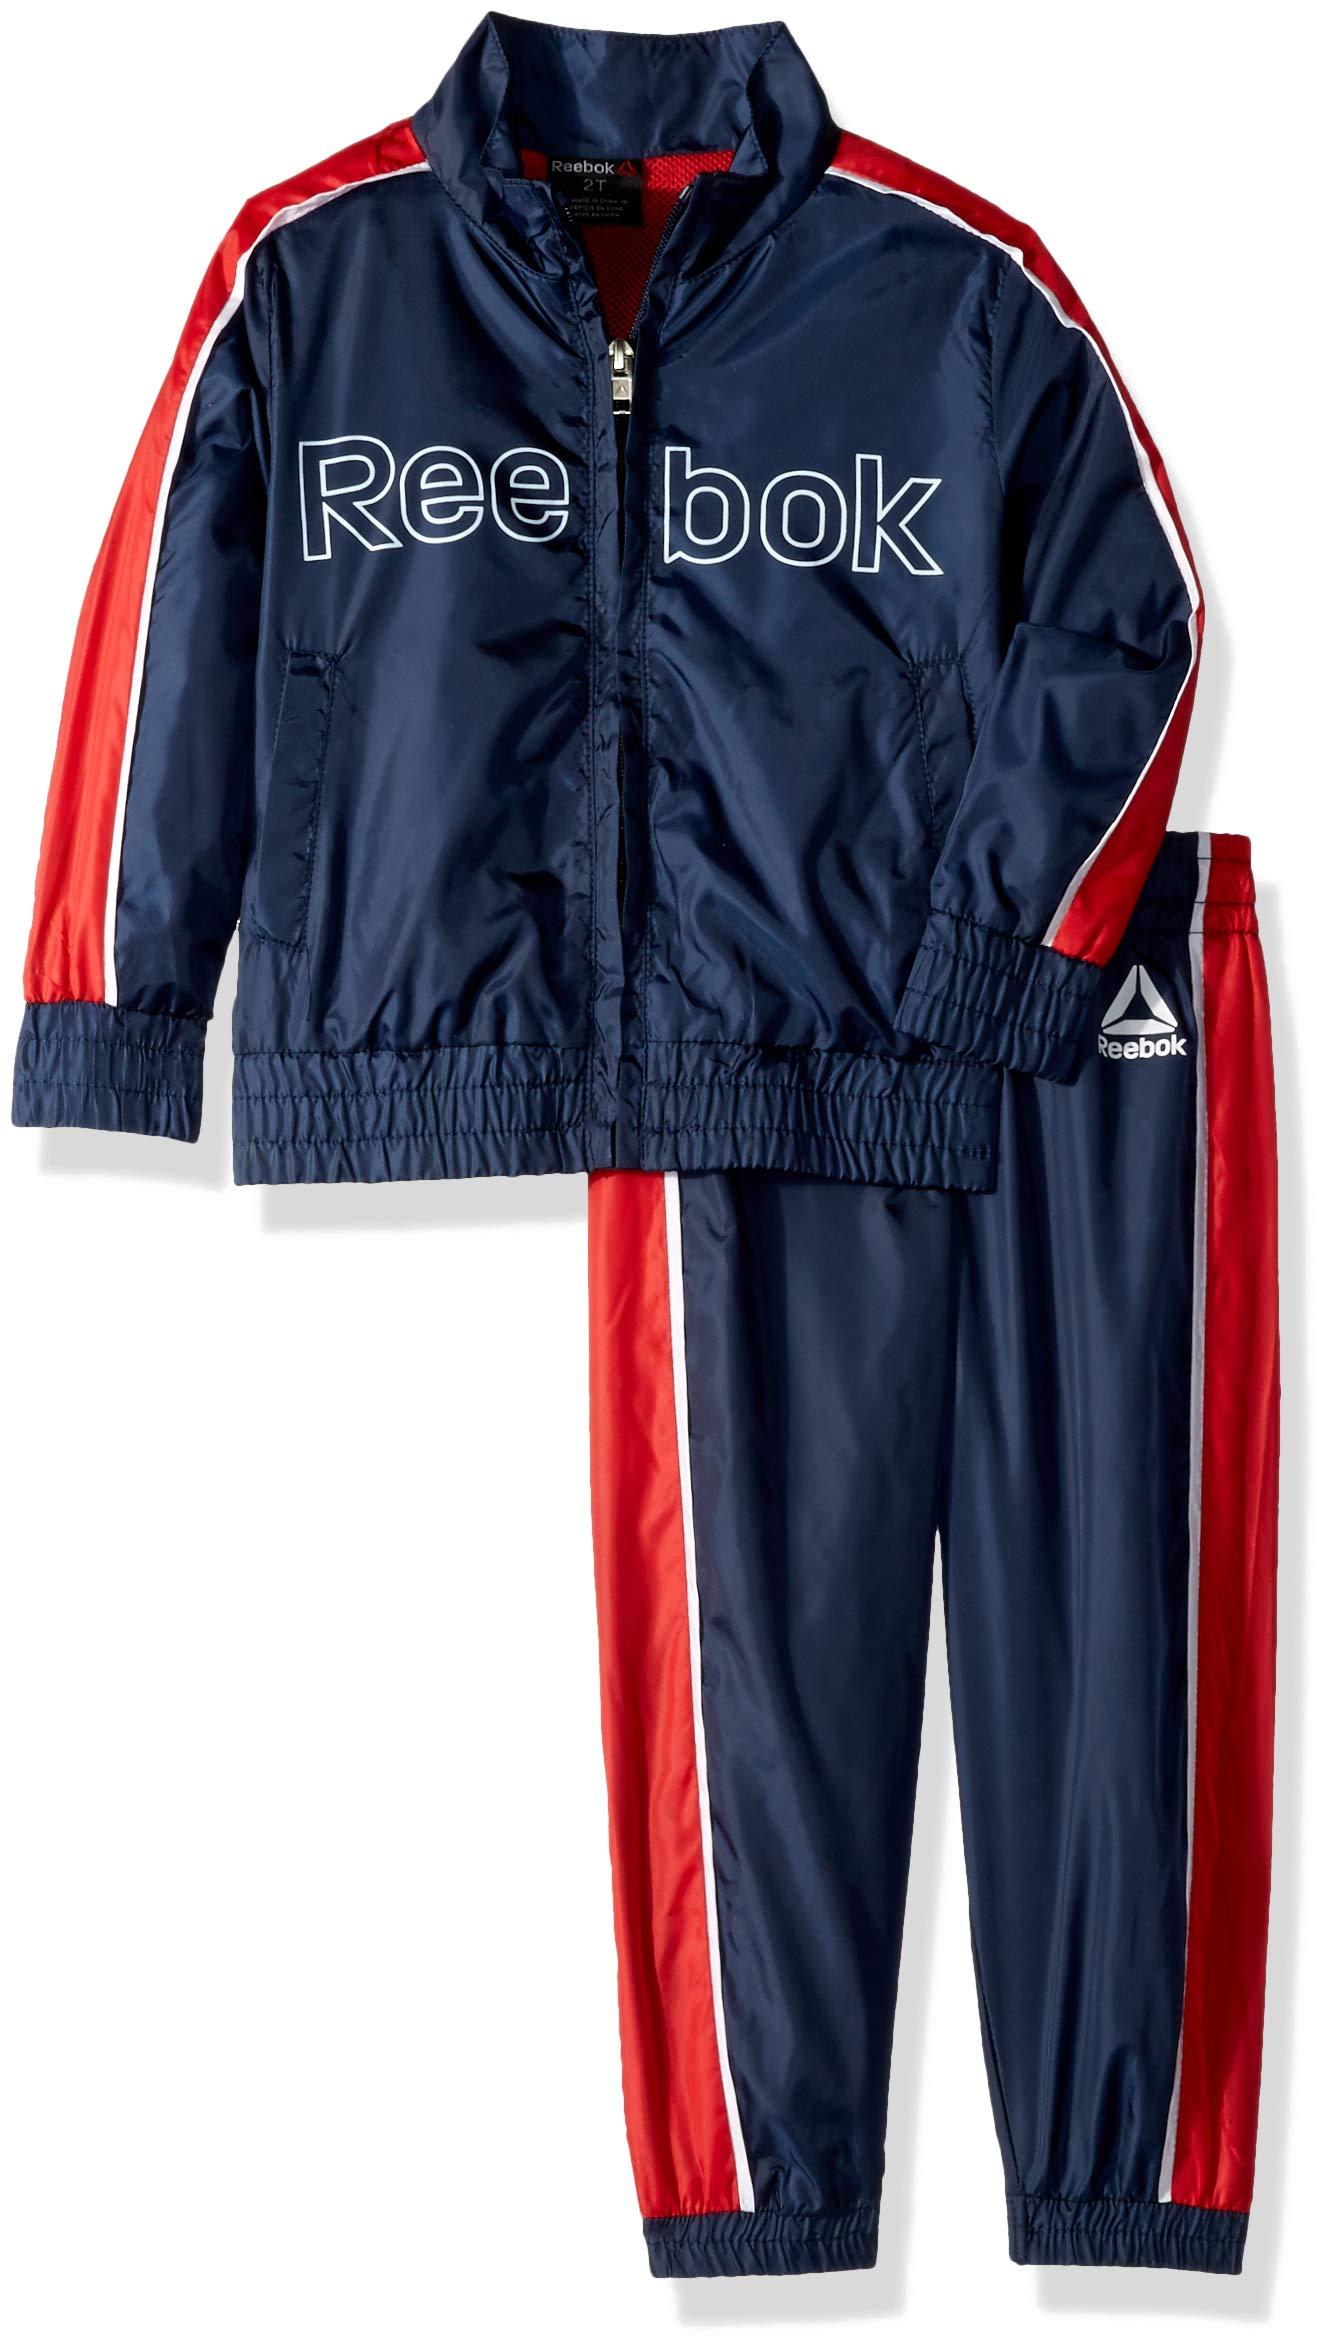 Reebok Boys' Toddler Nylon Retro Windsuit Zip Up